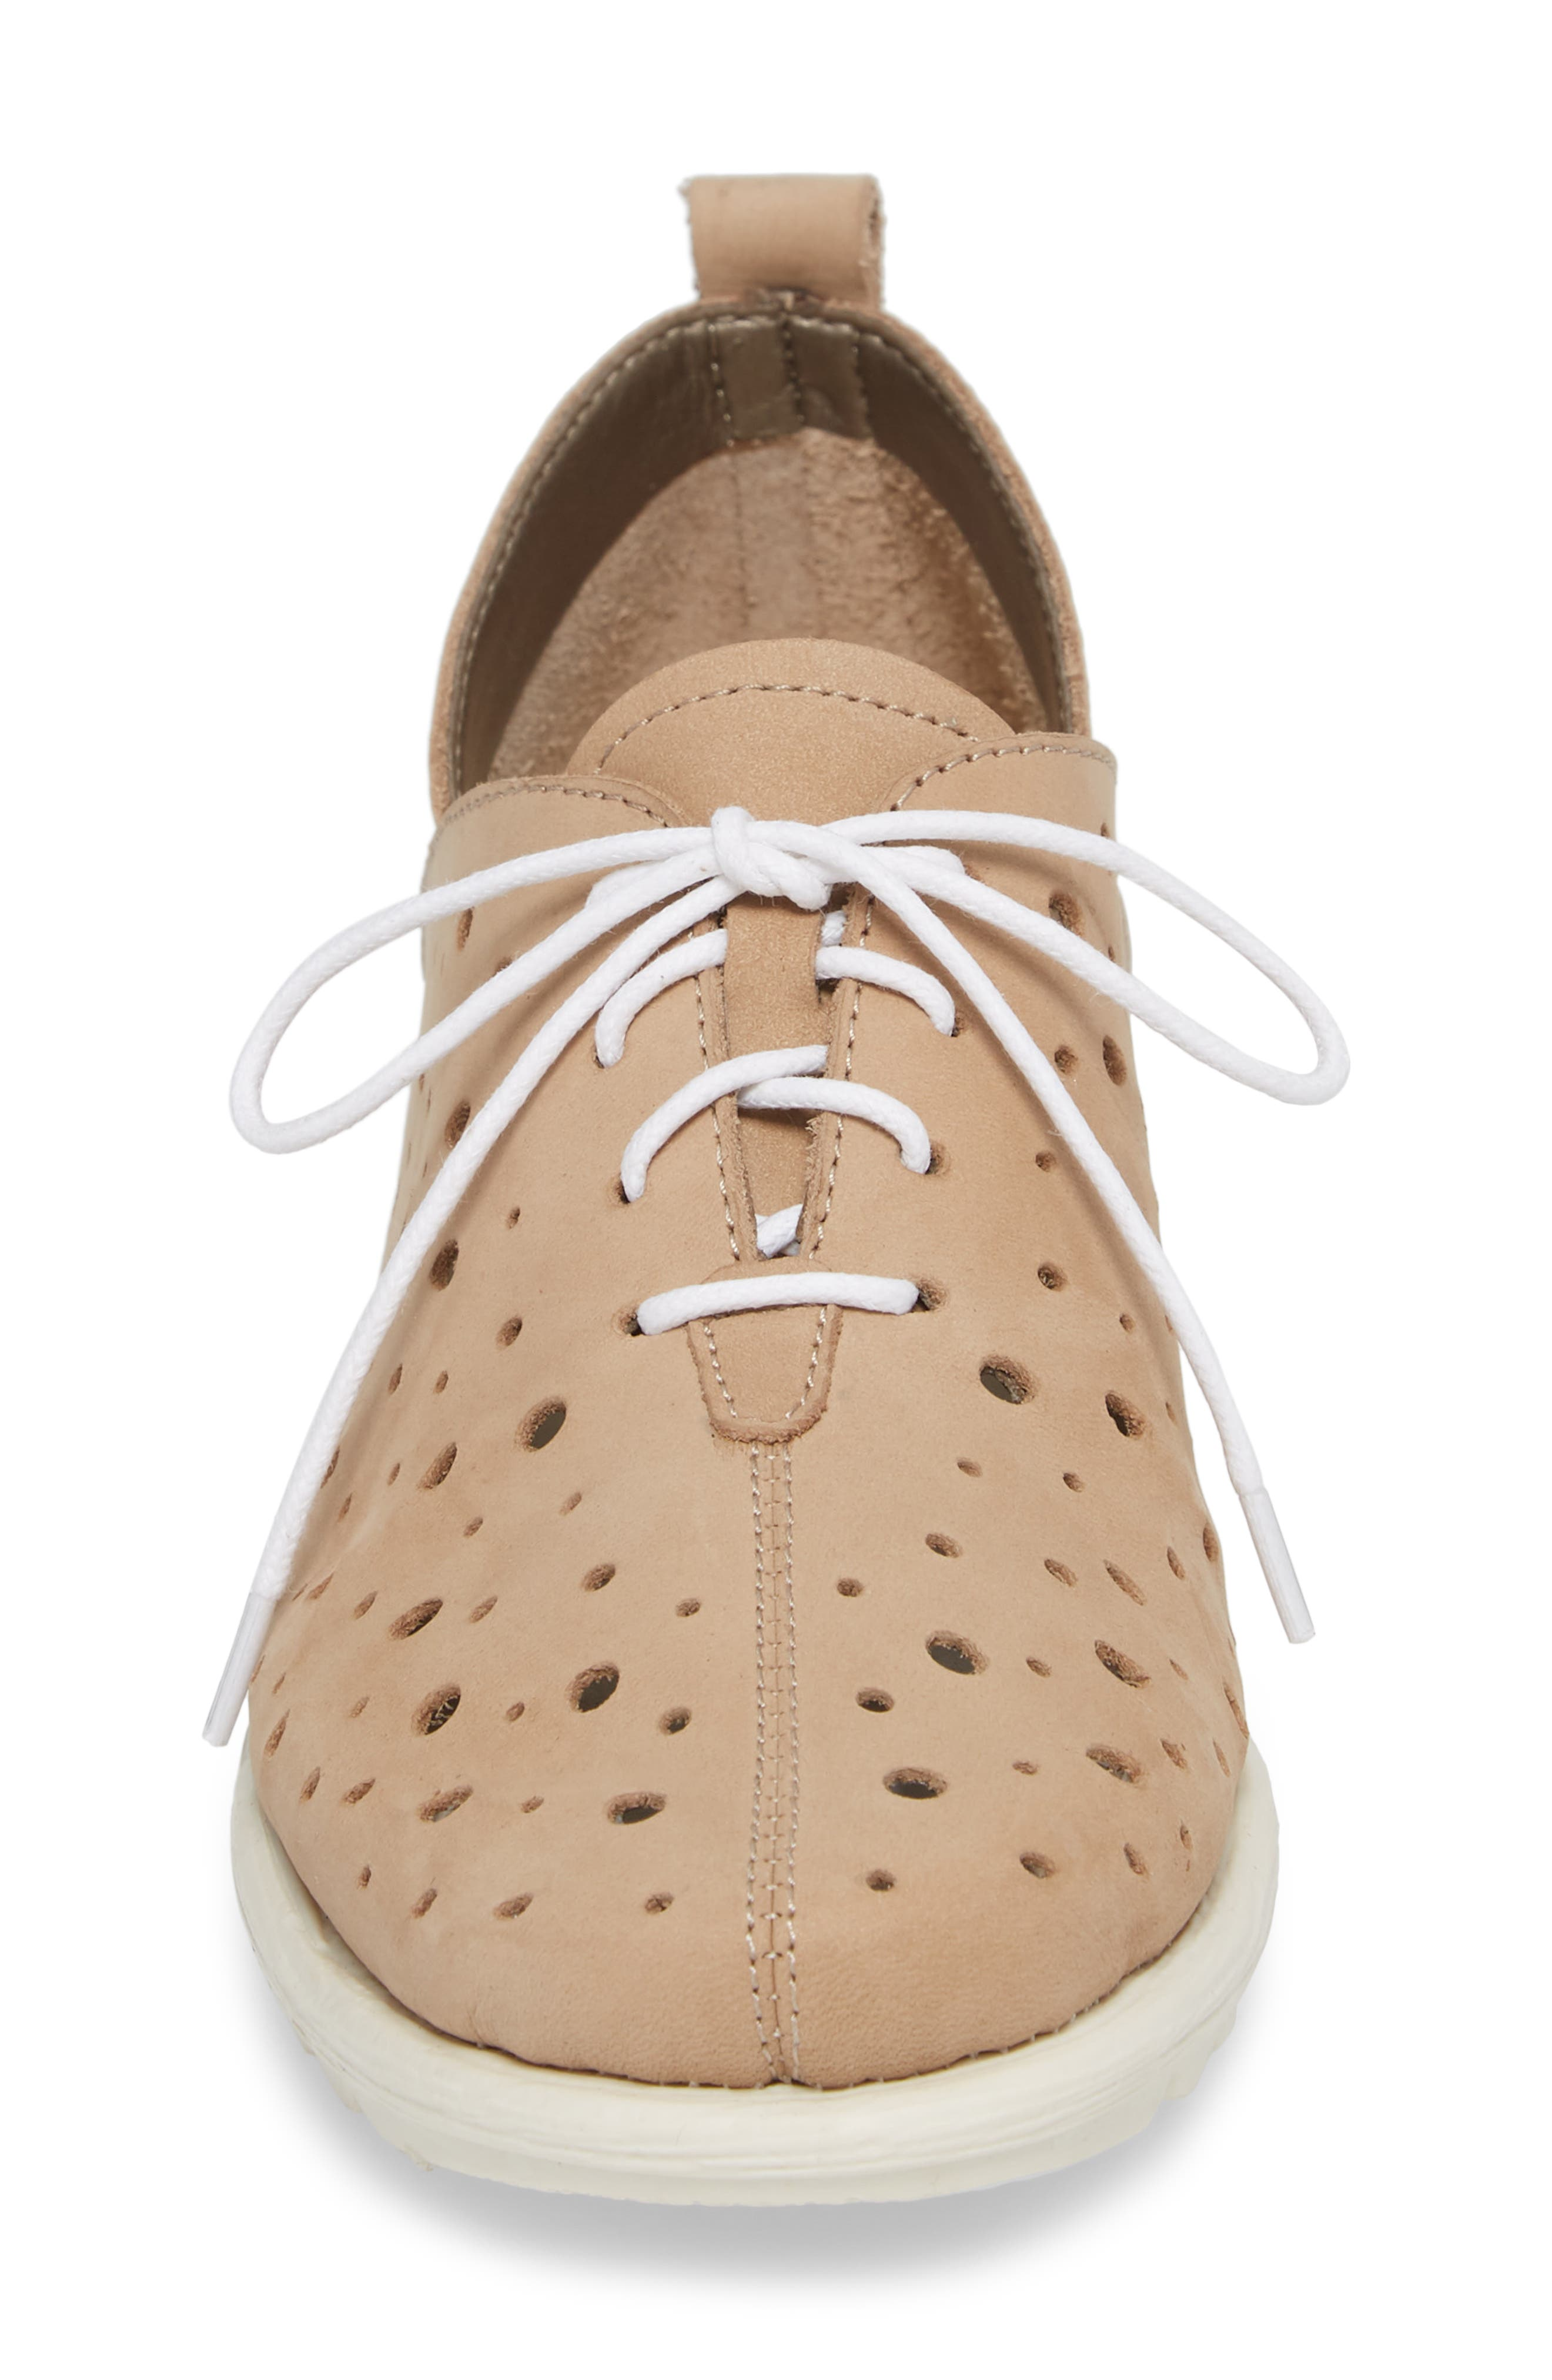 Run Crazy Too Perforated Wedge Sneaker,                             Alternate thumbnail 4, color,                             Dune Nubuck